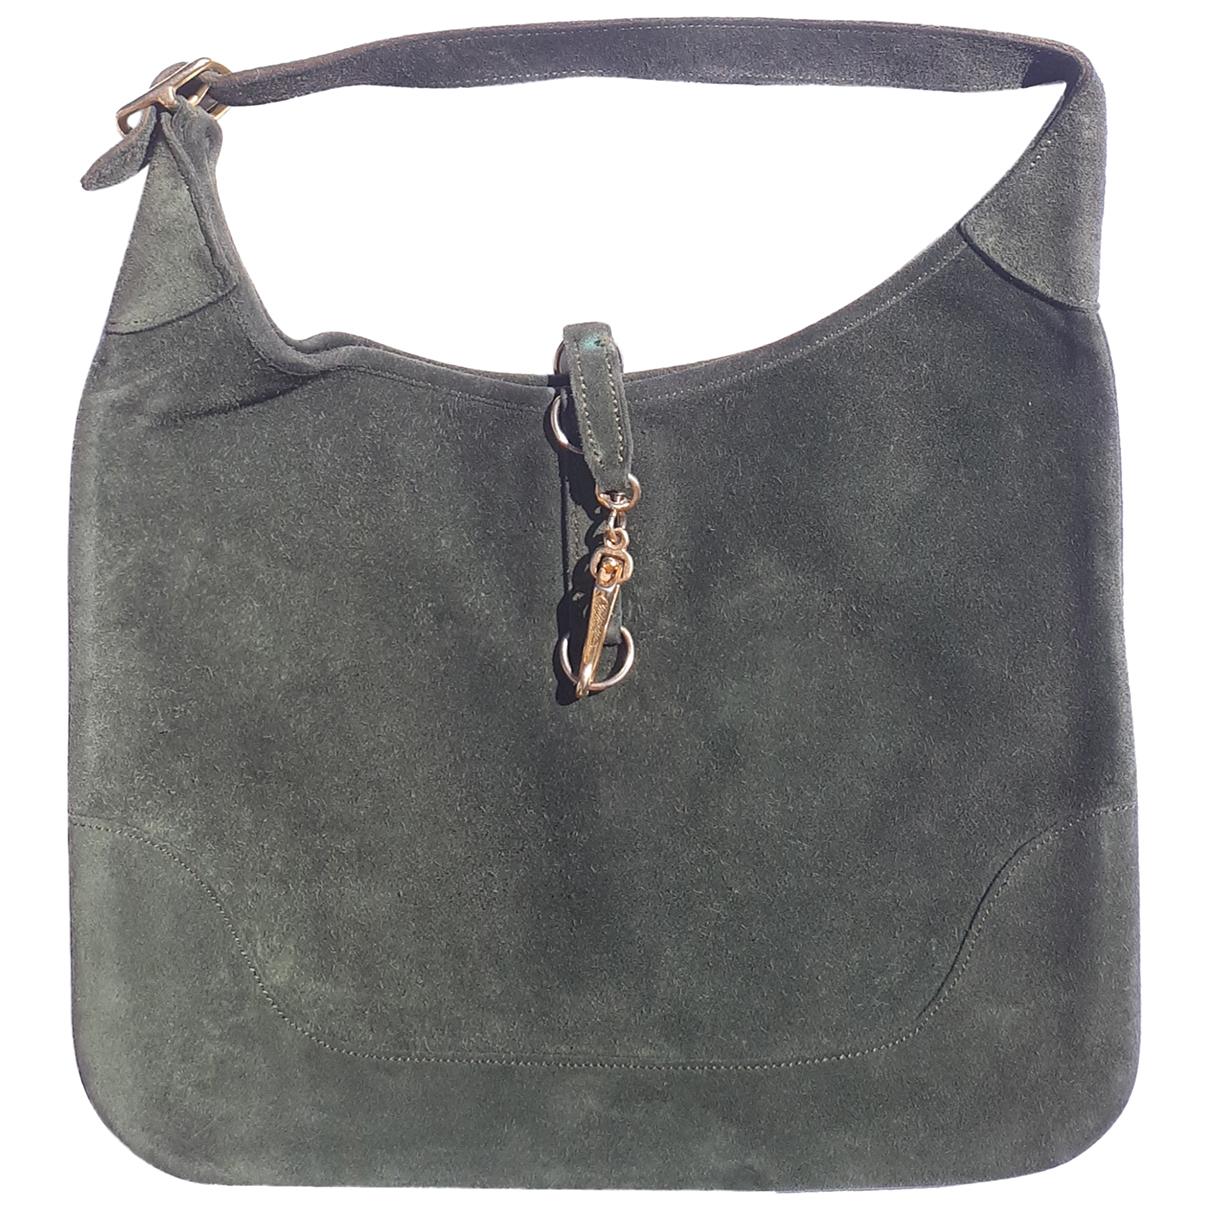 Hermes Trim Handtasche in  Gruen Veloursleder